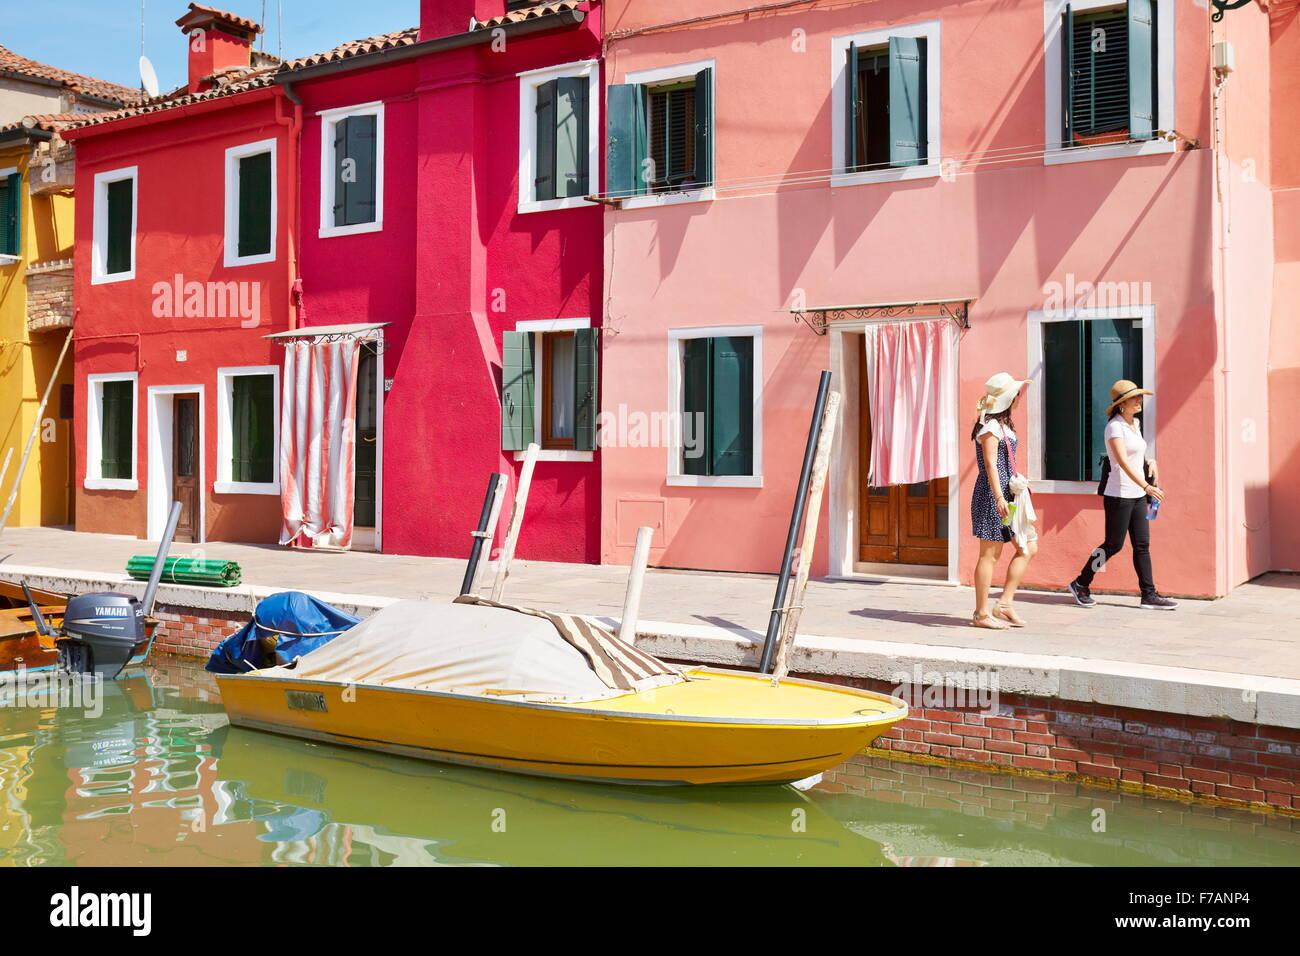 Colorful burano italy burano tourism - Colored Houses In Burano Village Near Venice Burano Lagoon Island Italy